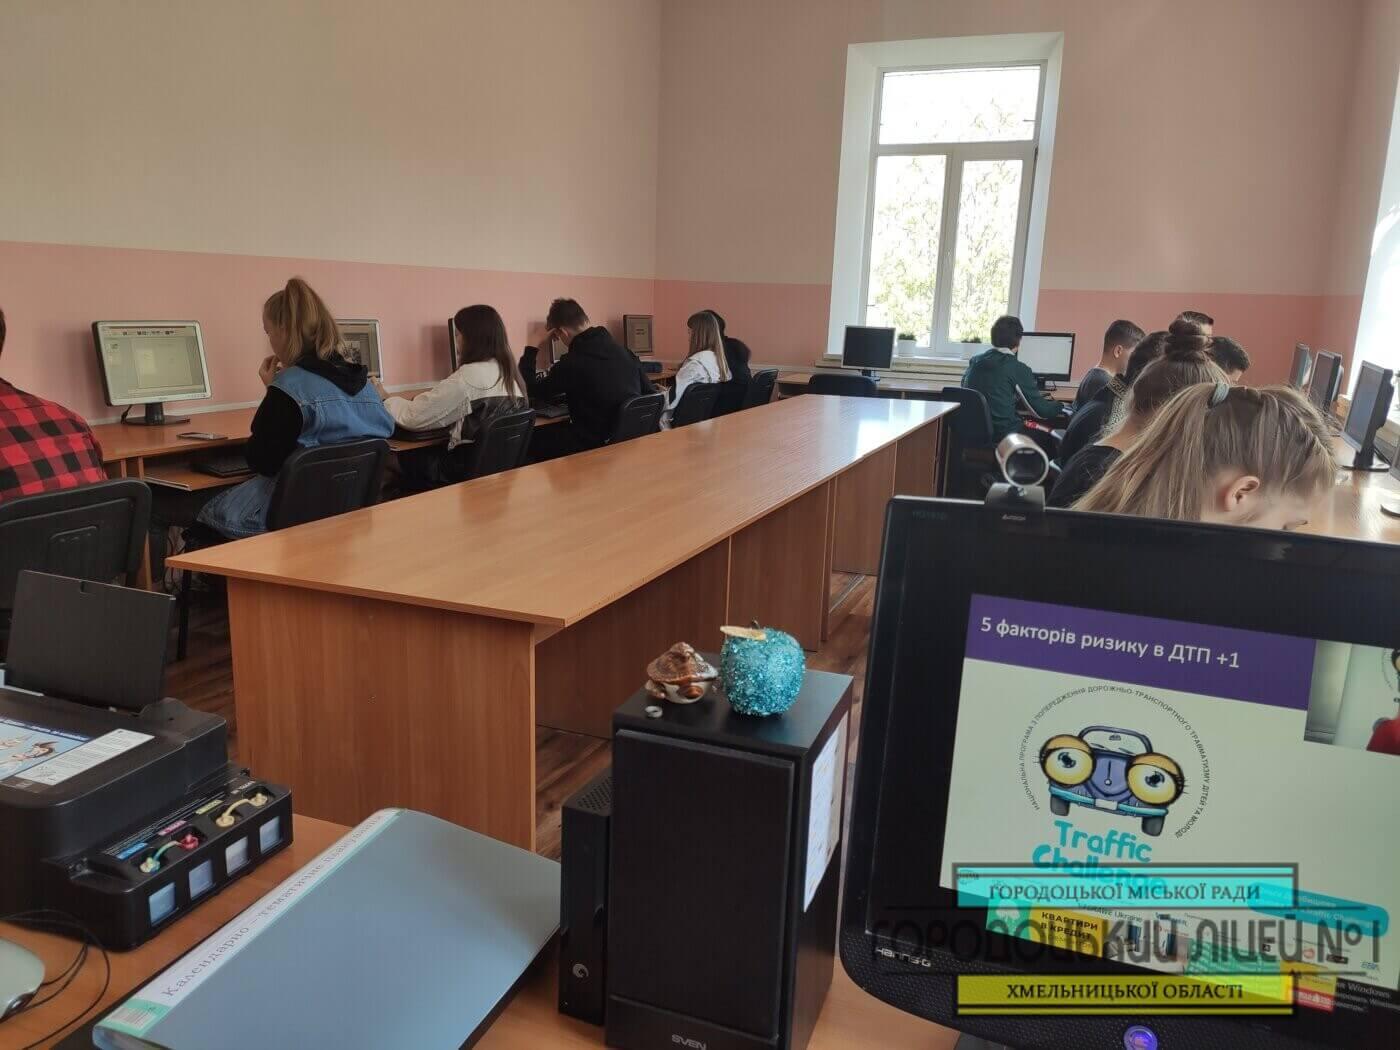 img 20210512 103646 1400x1050 - ІІ етап Всеукраїнського змагання #Хештег_Марафон #SafetyChallenge